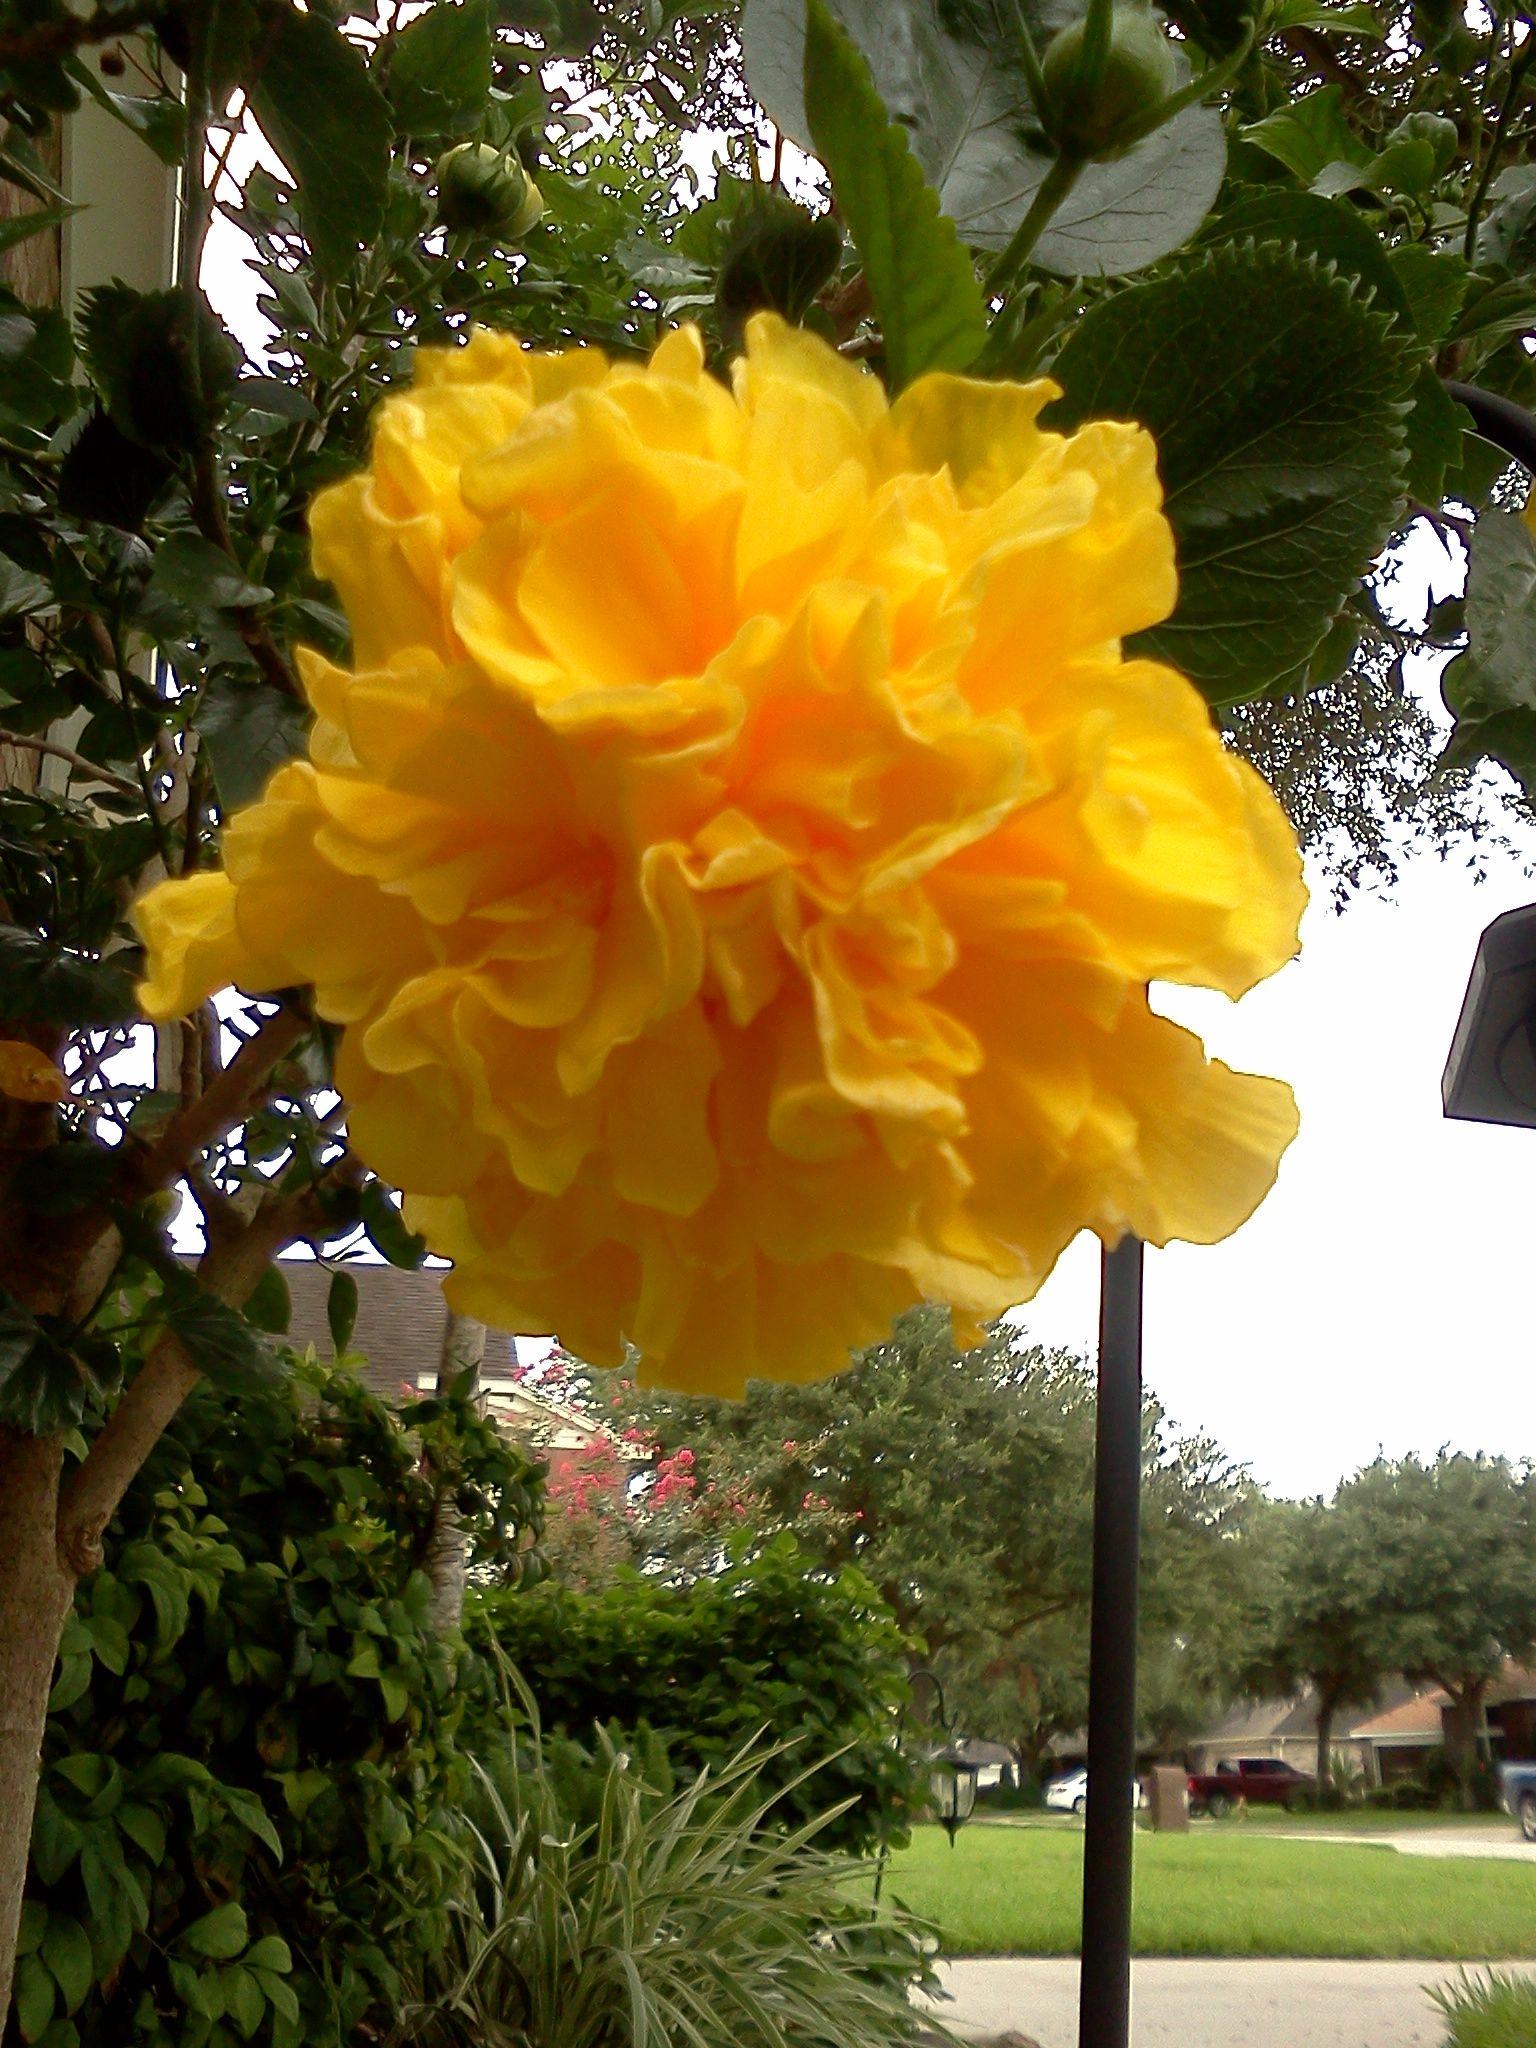 Texas yellow gardenia beautiful flowers pinterest flowers texas yellow gardenia texas yellow gardenia beautiful flowers izmirmasajfo